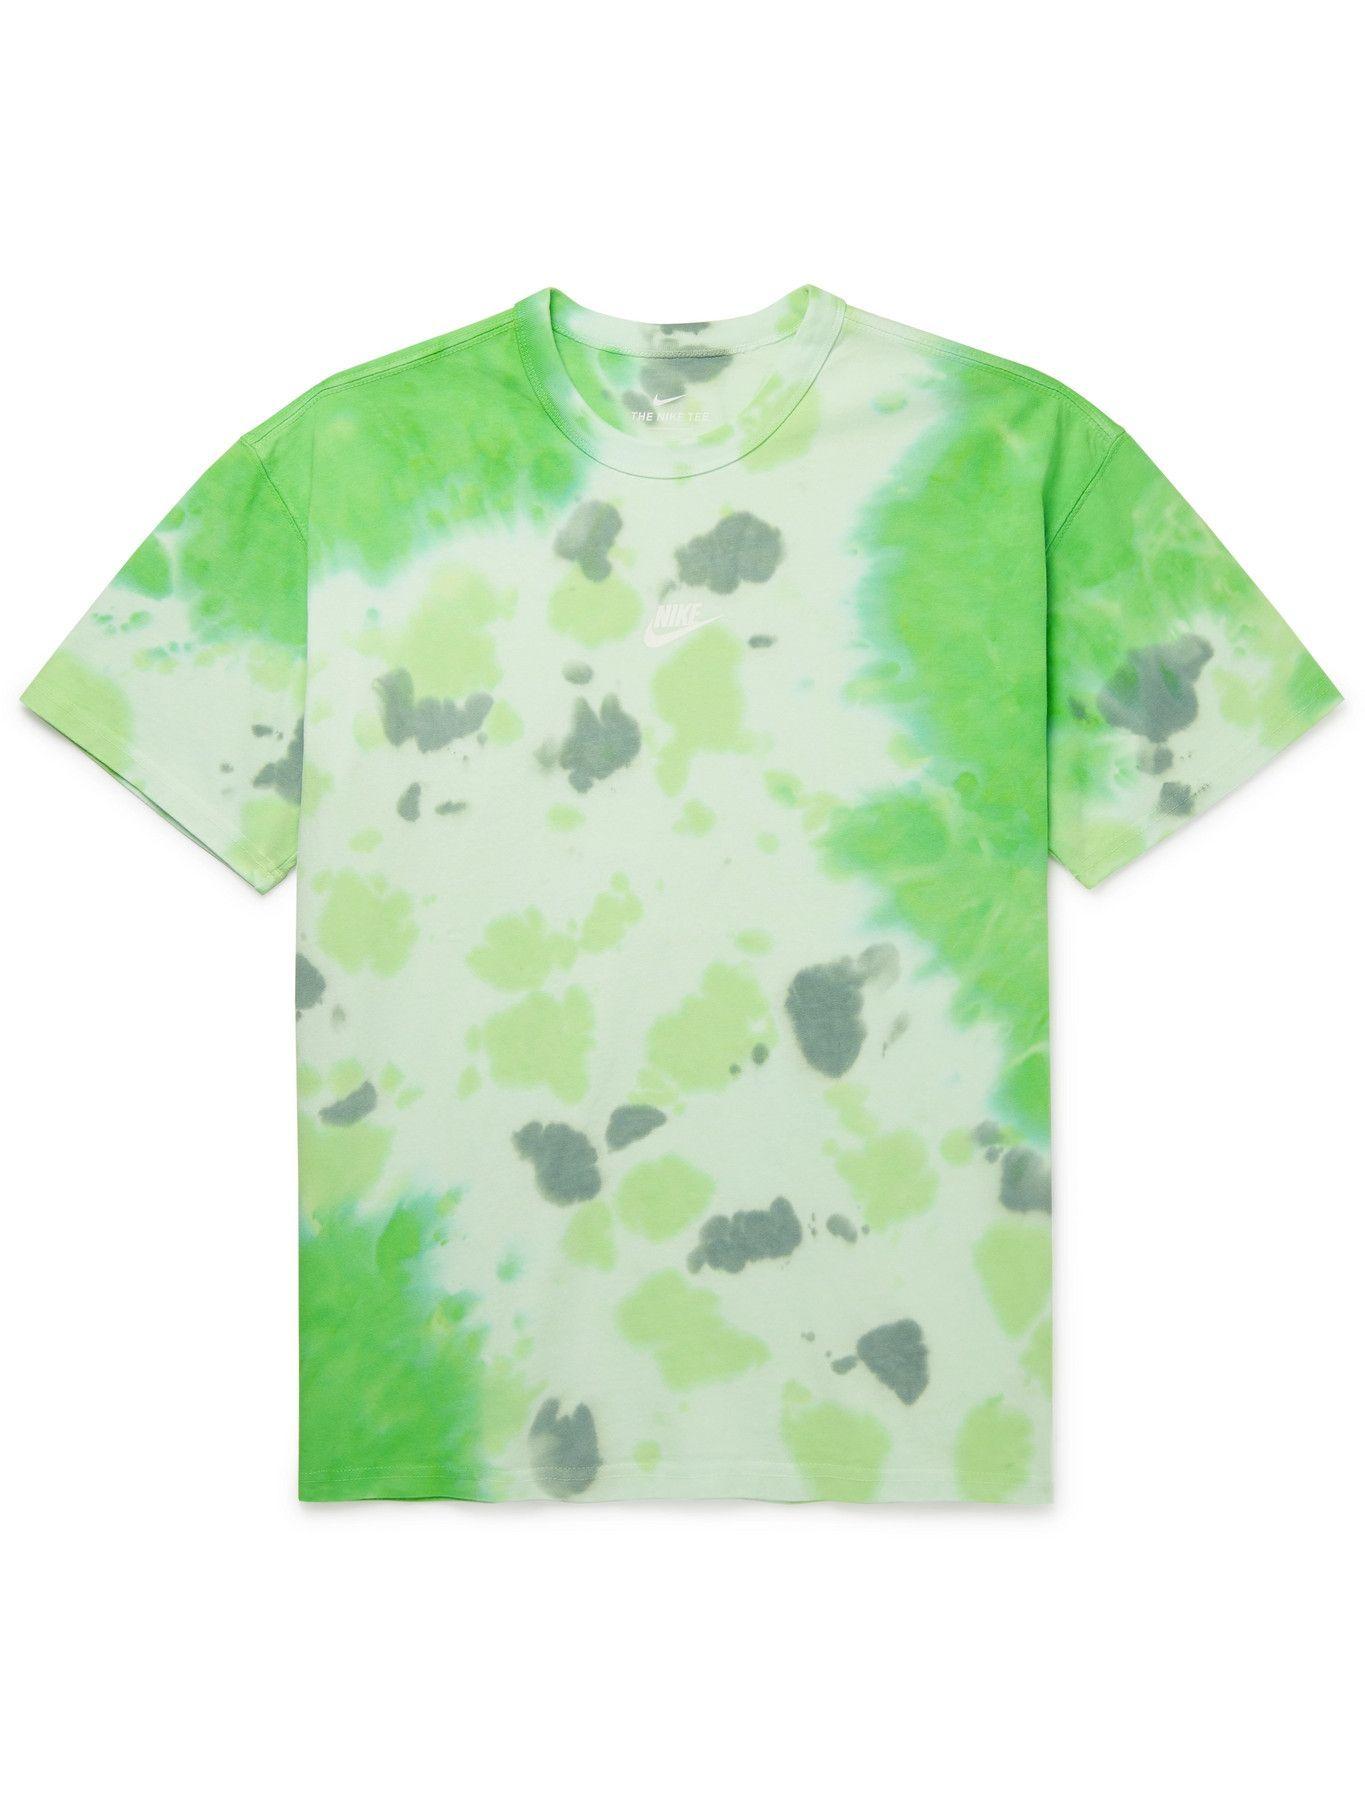 Photo: NIKE - NSW Logo-Print Tie-Dyed Cotton-Jersey T-Shirt - Green